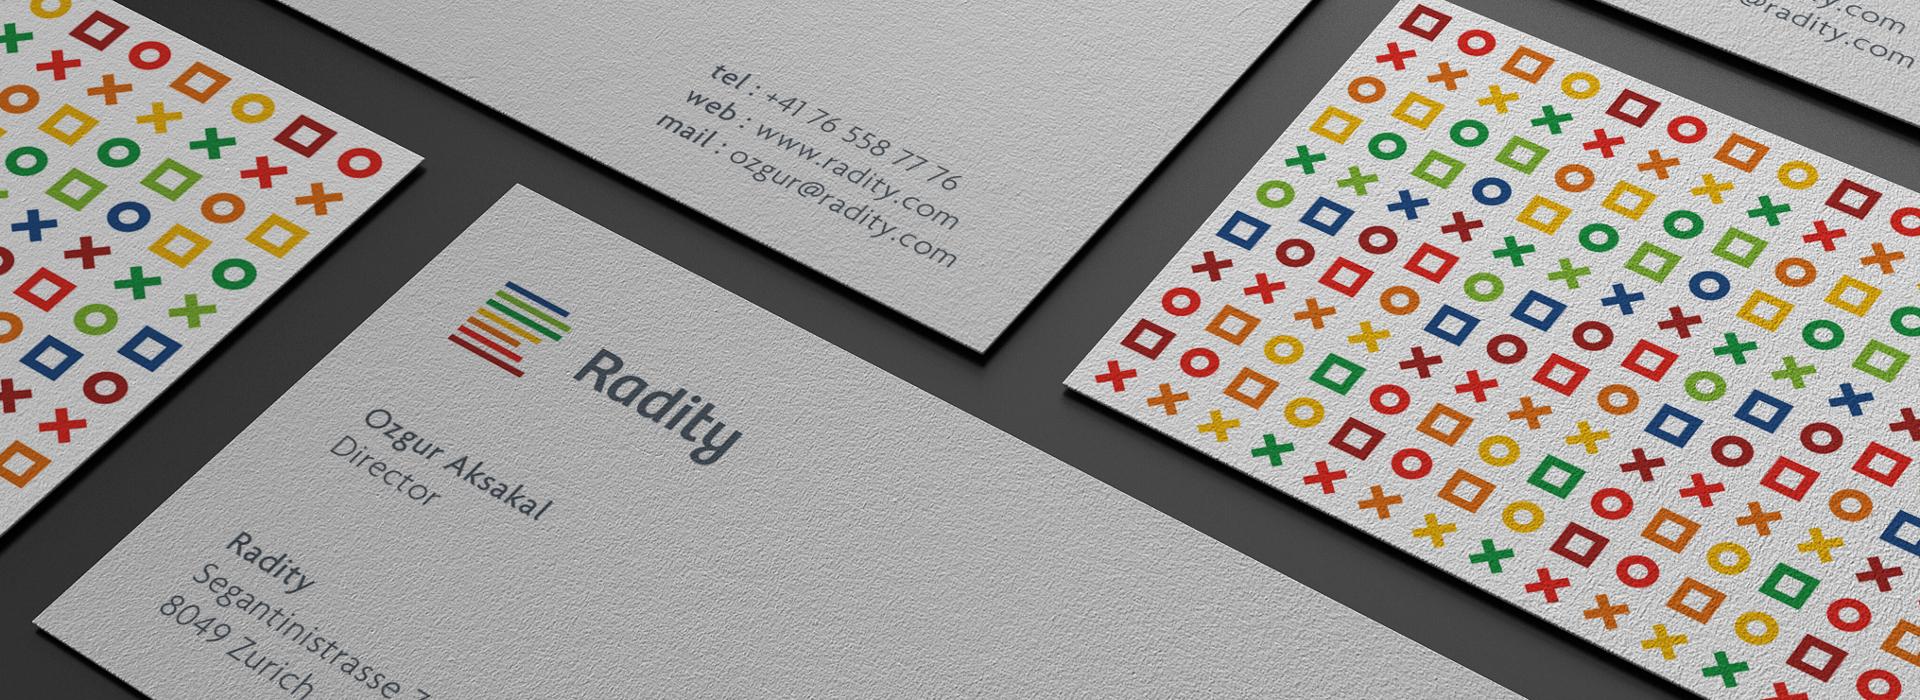 creative stationery mock up designs